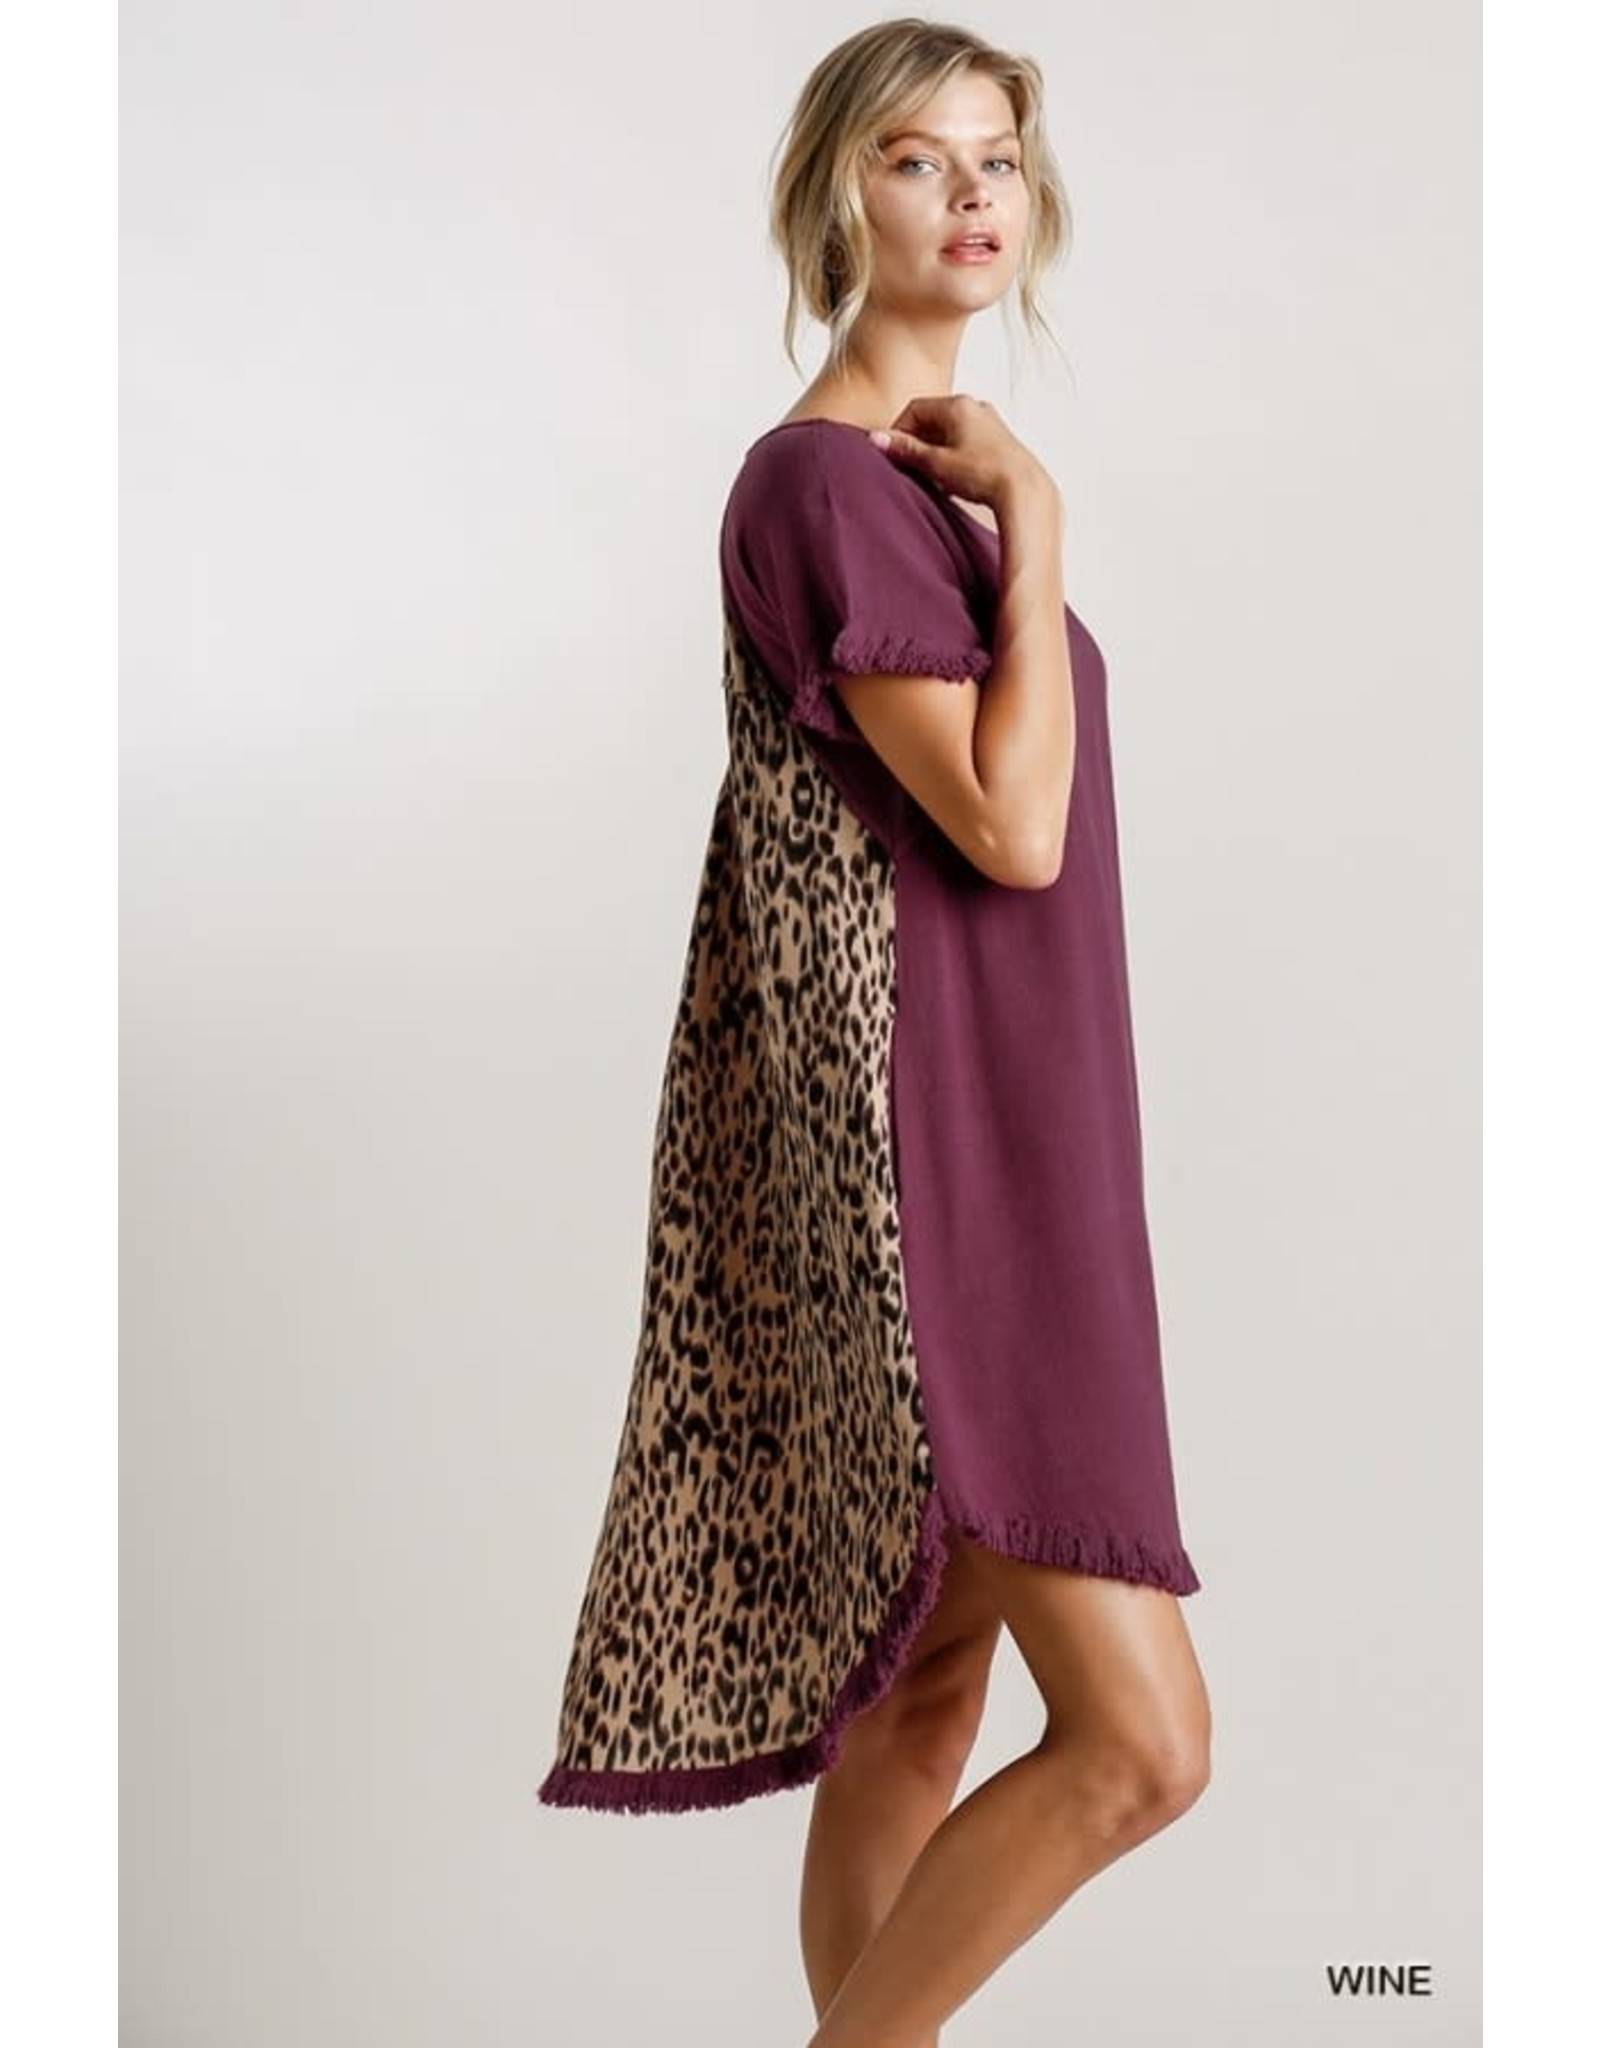 Umgee Fishtail Scoop Animal Print Dress